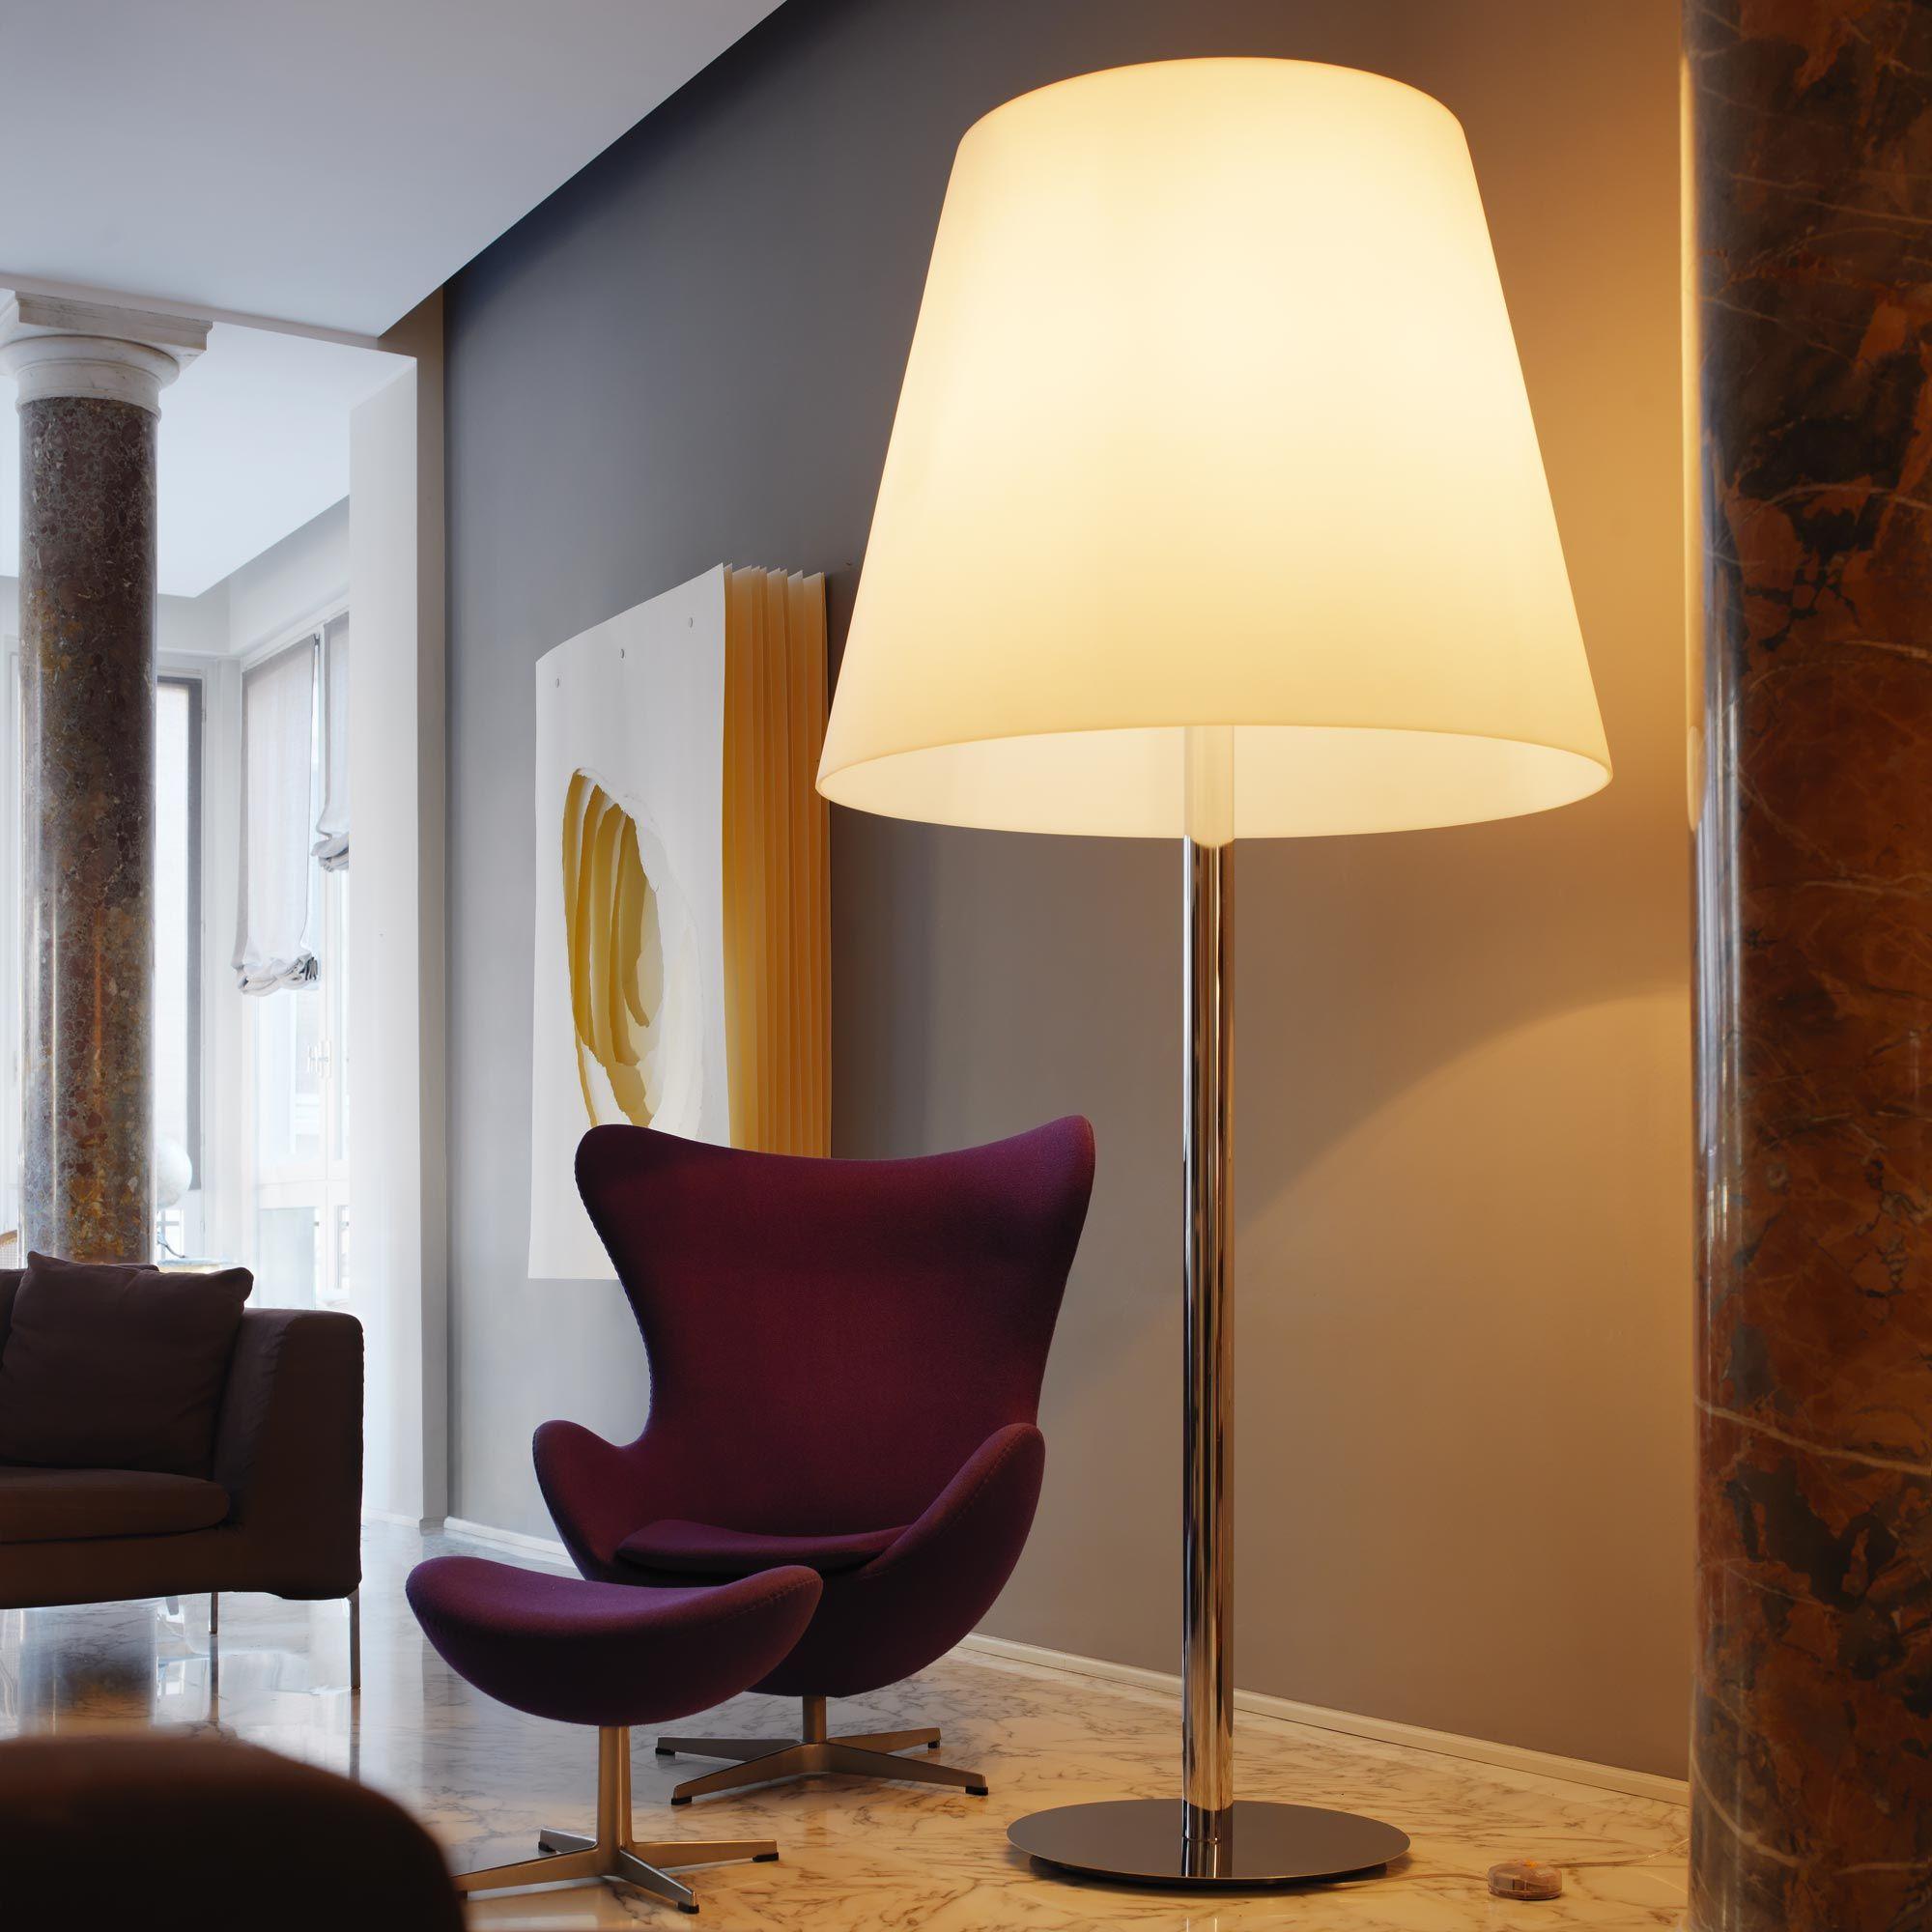 Pin Von Lighting Auf Decorative Floor Lamps Grosse